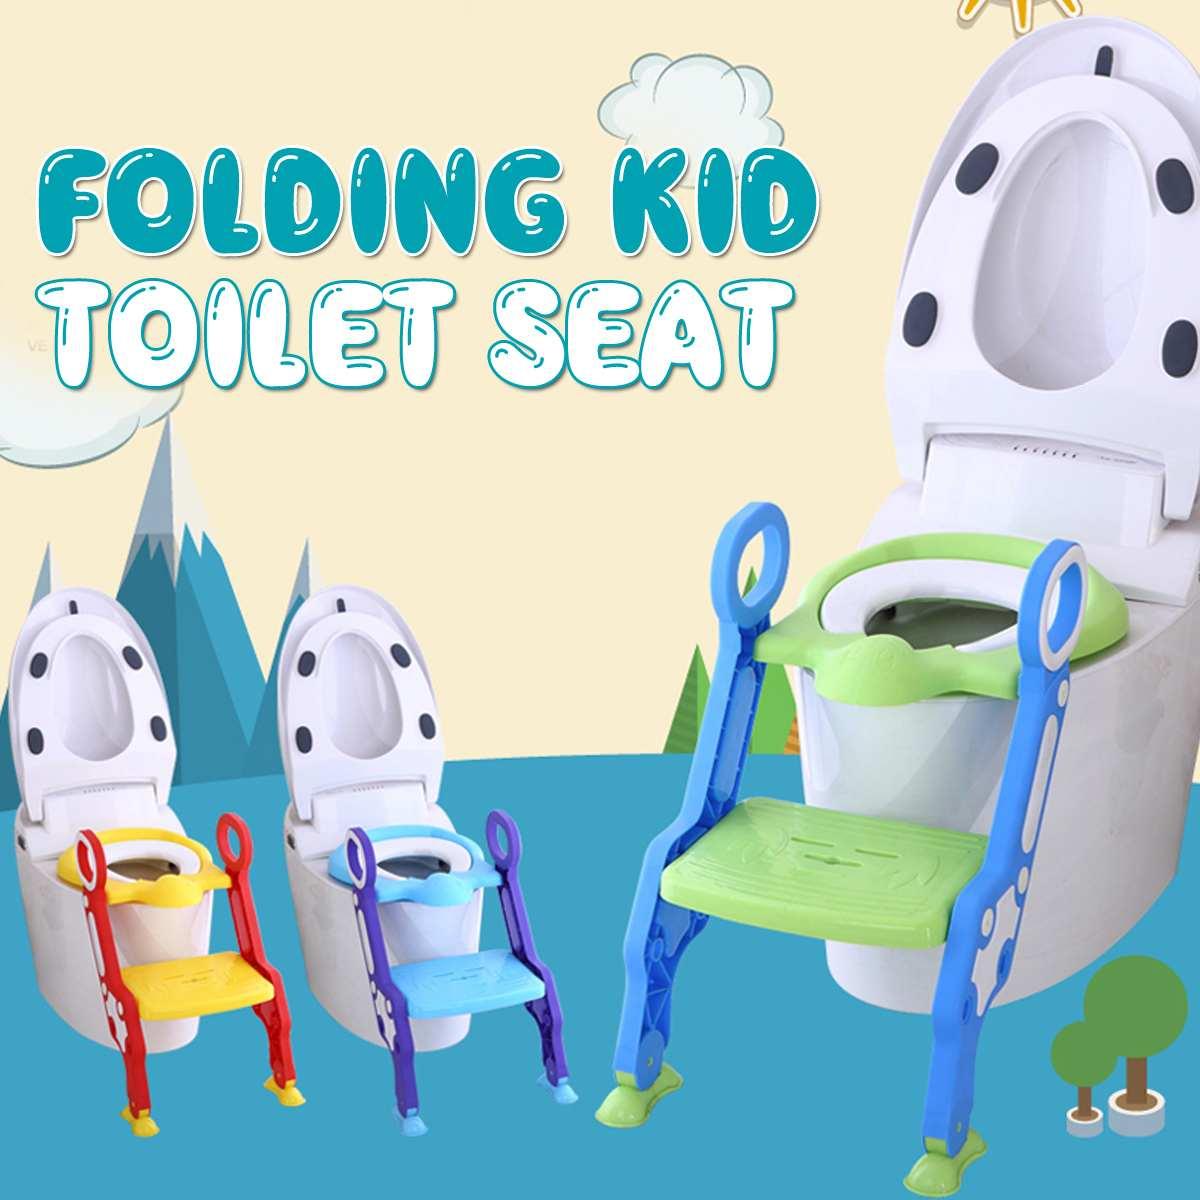 Baby Potty Training Seat Child Potty Toilet Baby Toilet Seat With Adjustable Ladder Infant Toilet Training Folding Seat